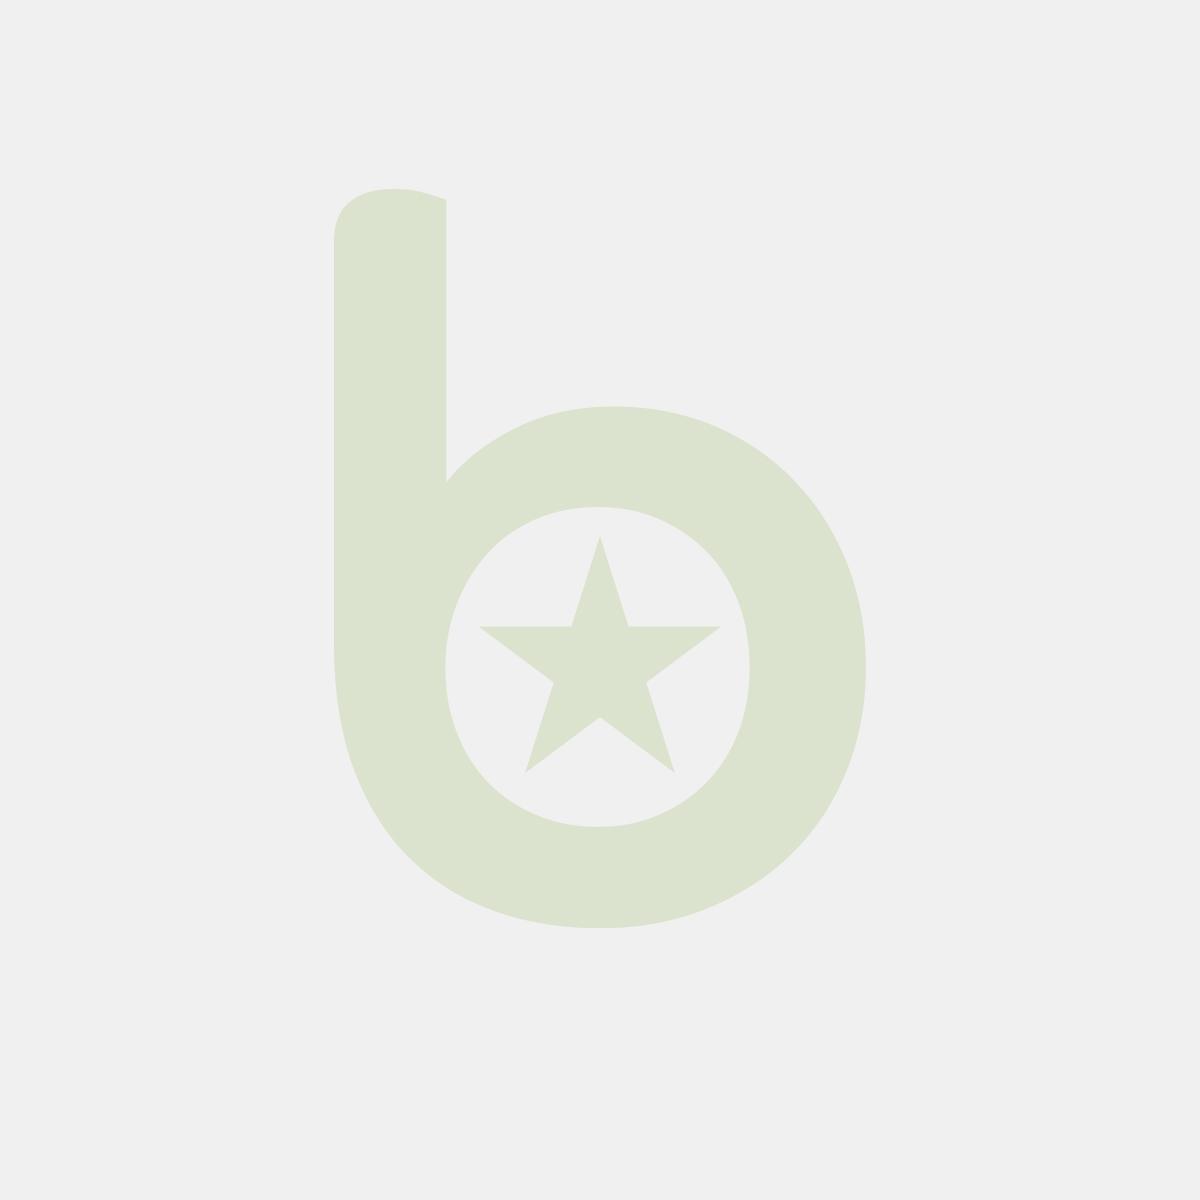 Grill lawowy 490x800 - kod 143032